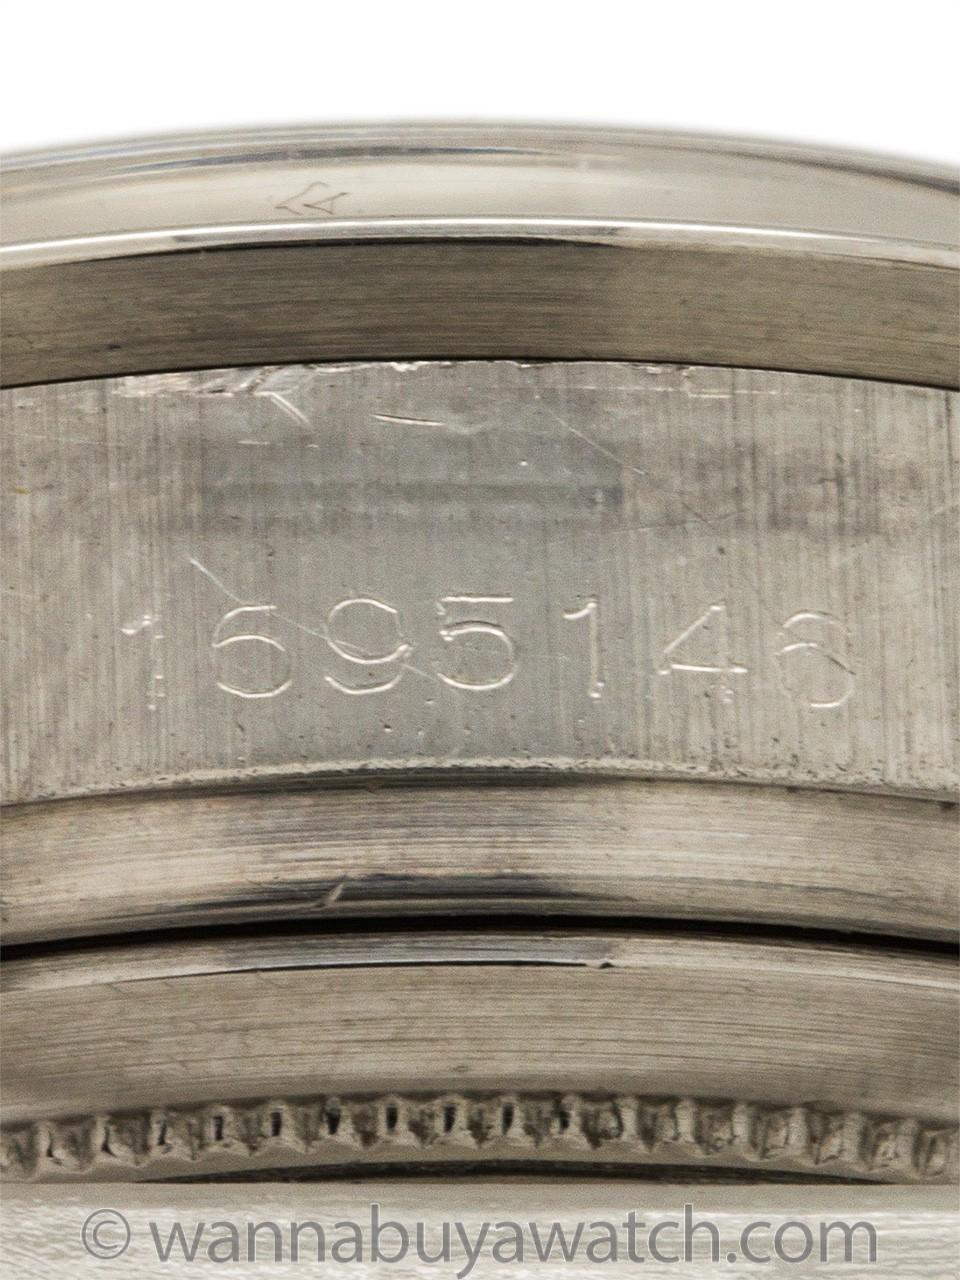 Rolex Daytona ref 6239 Stainless Steel circa 1967